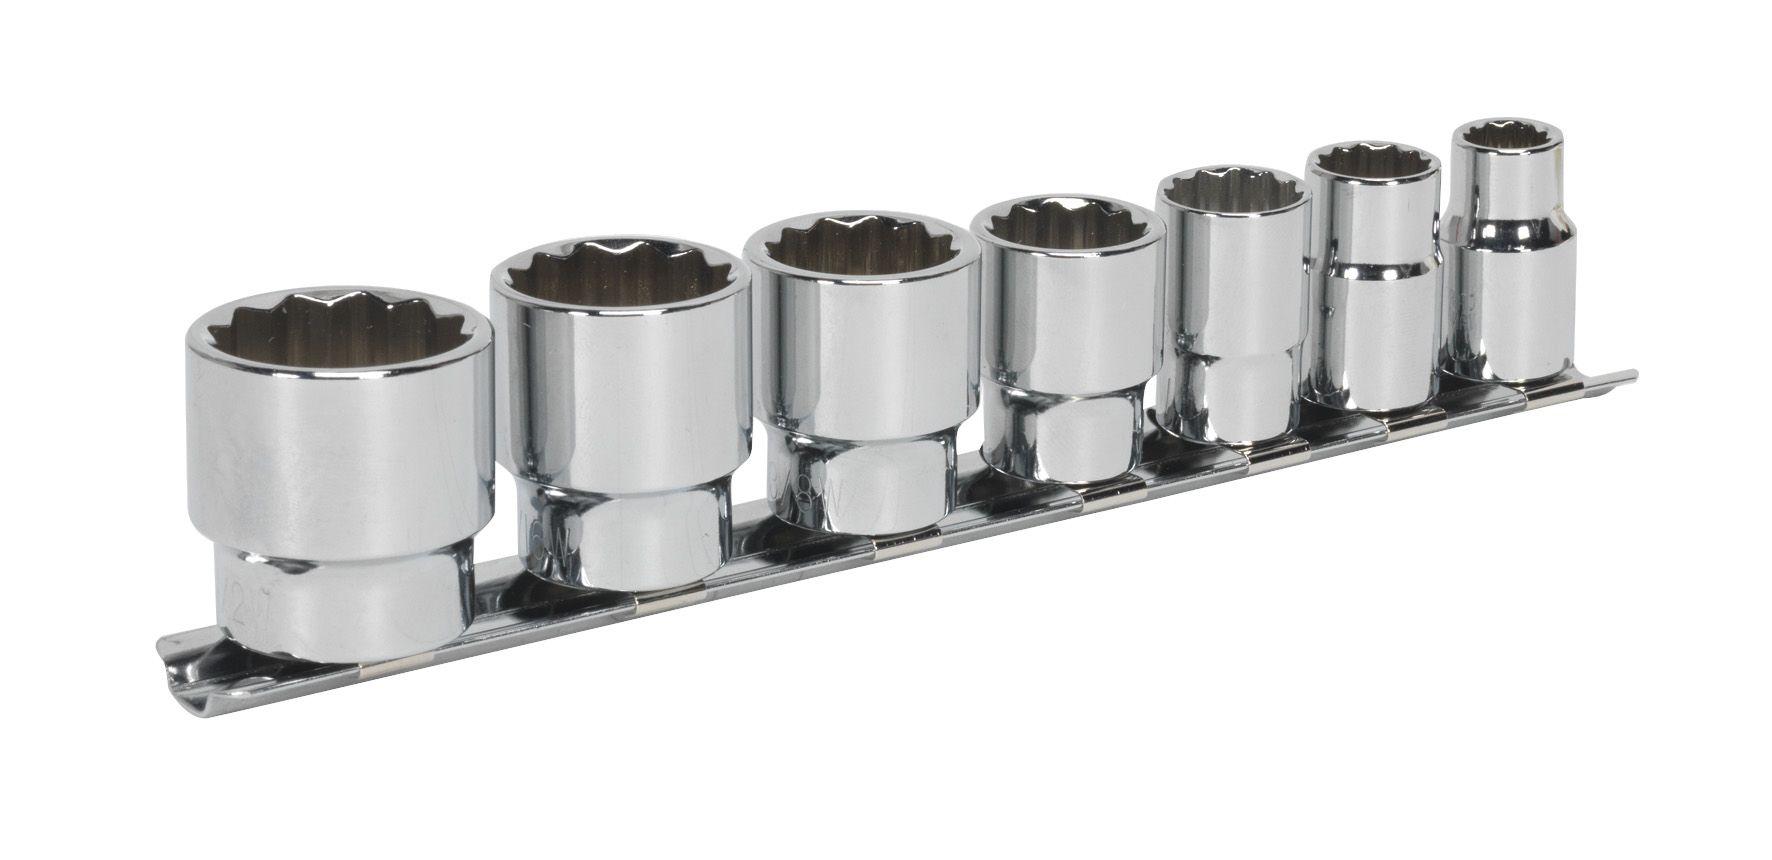 "Sealey Socket Set 7pc 3/8""Sq Drive Whitworth"